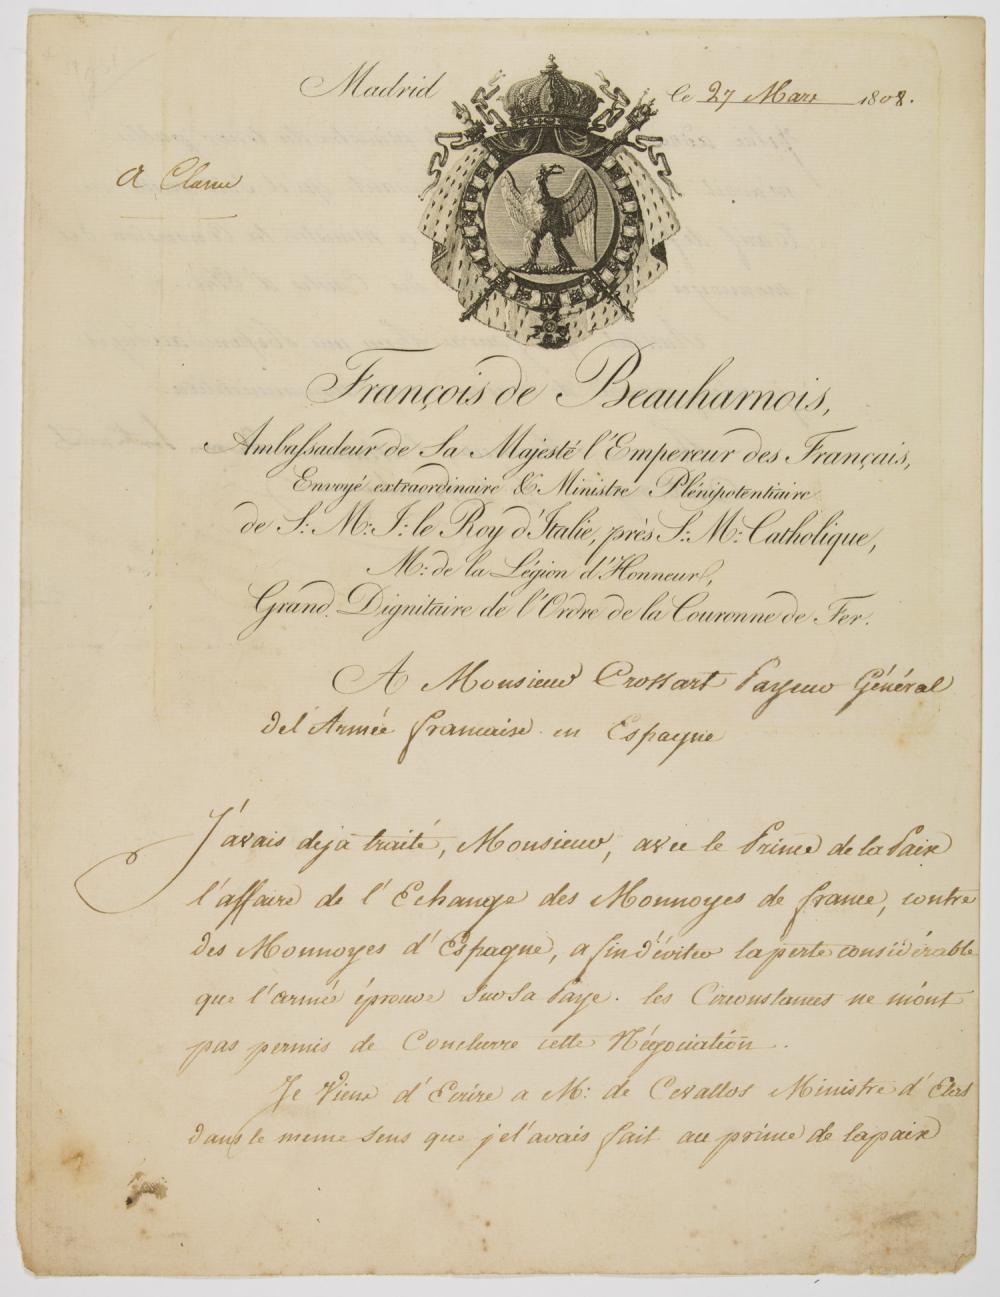 FRANCIS VI OF BEAUHARNAIS